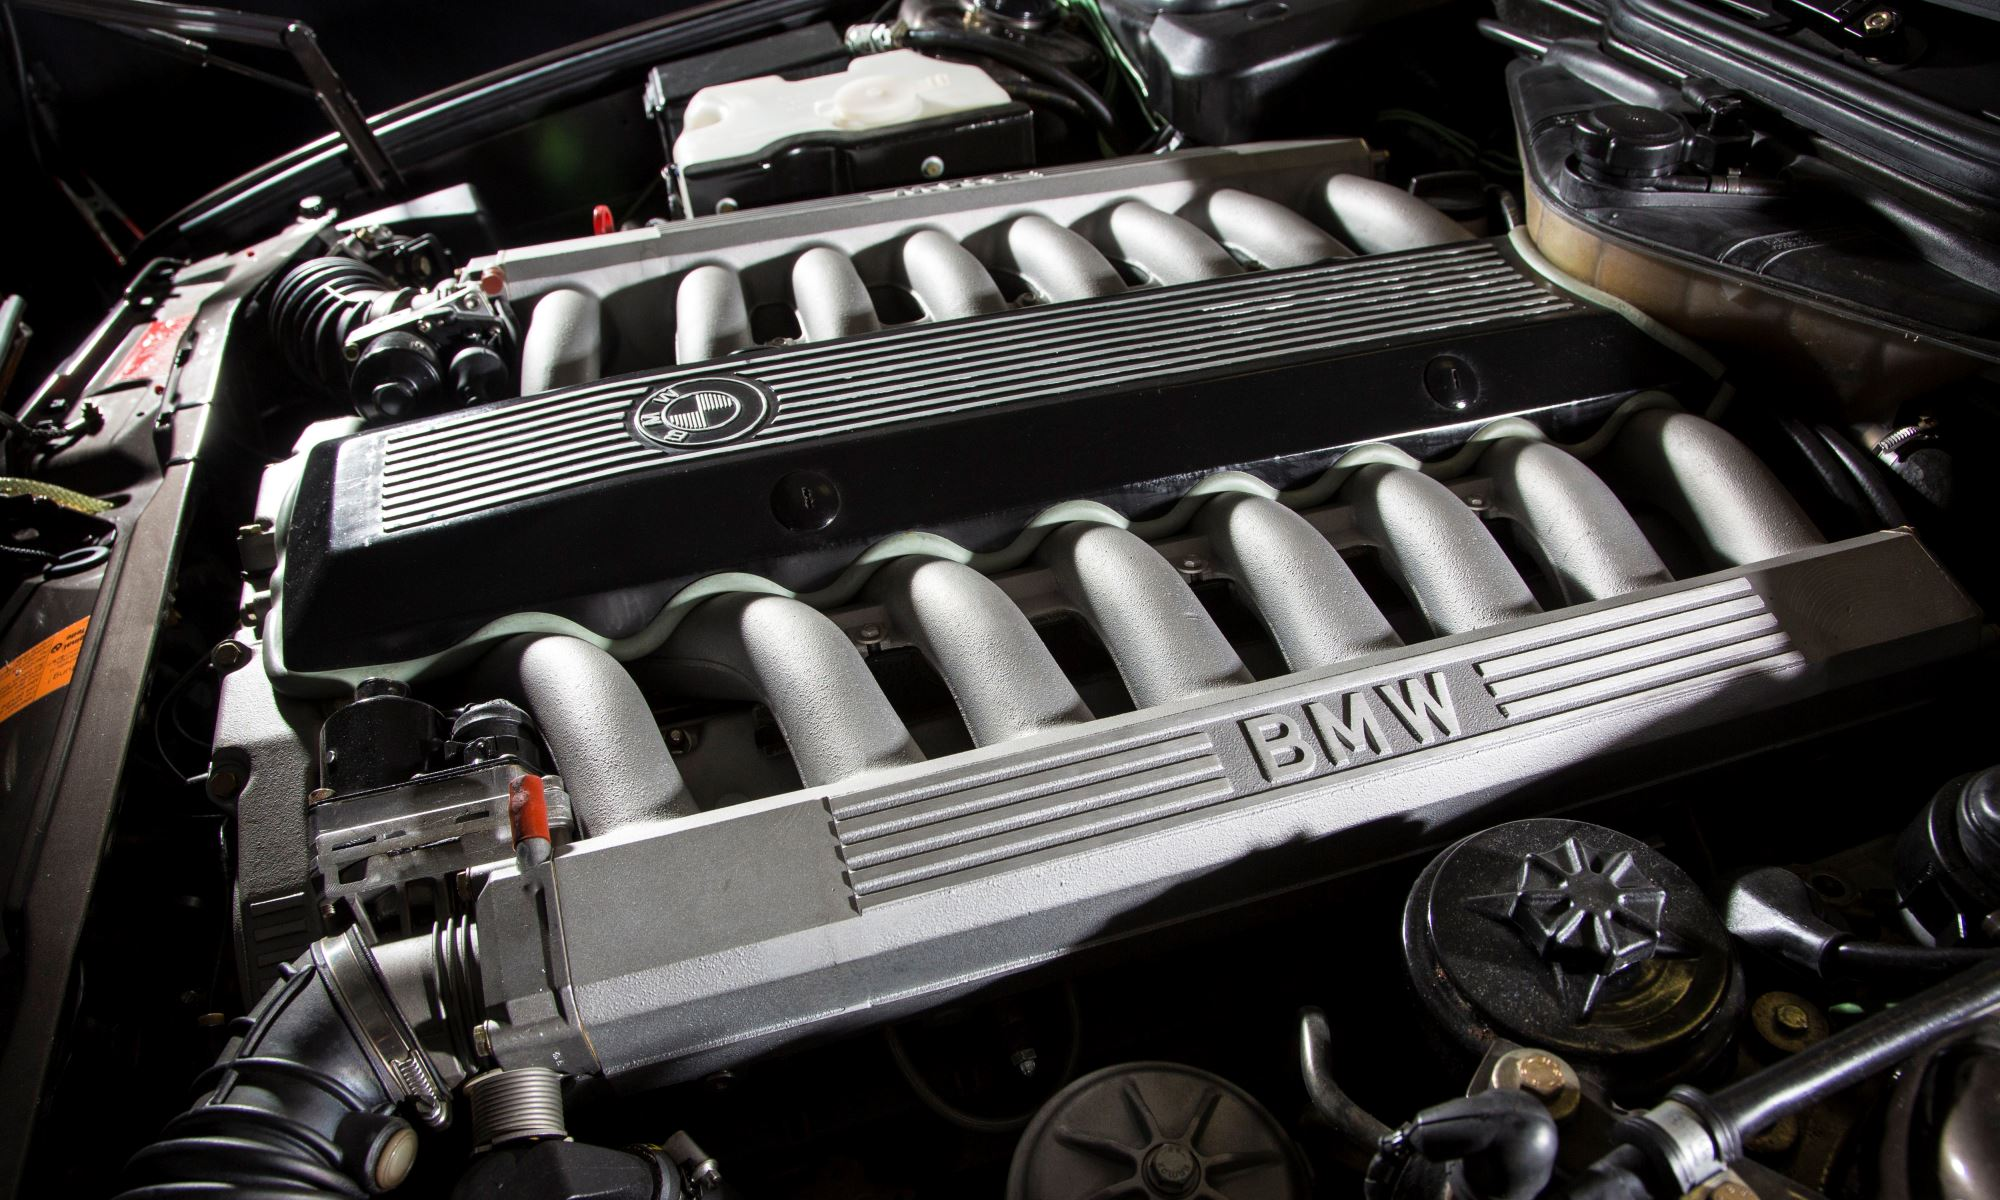 V16 BMW 7 Series engine